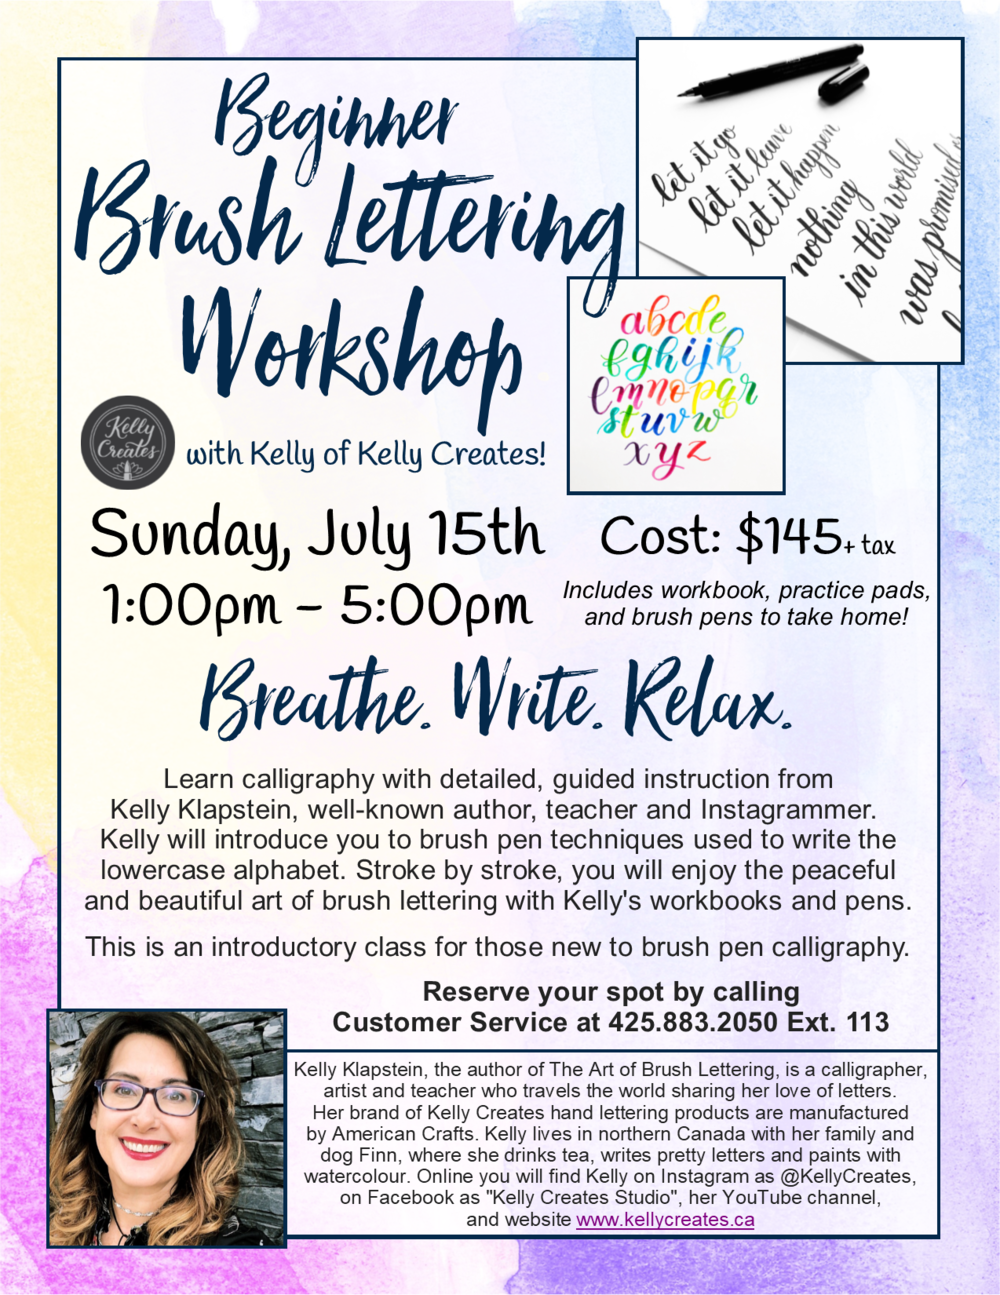 Beginner Brush Lettering Workshop with Phone.png